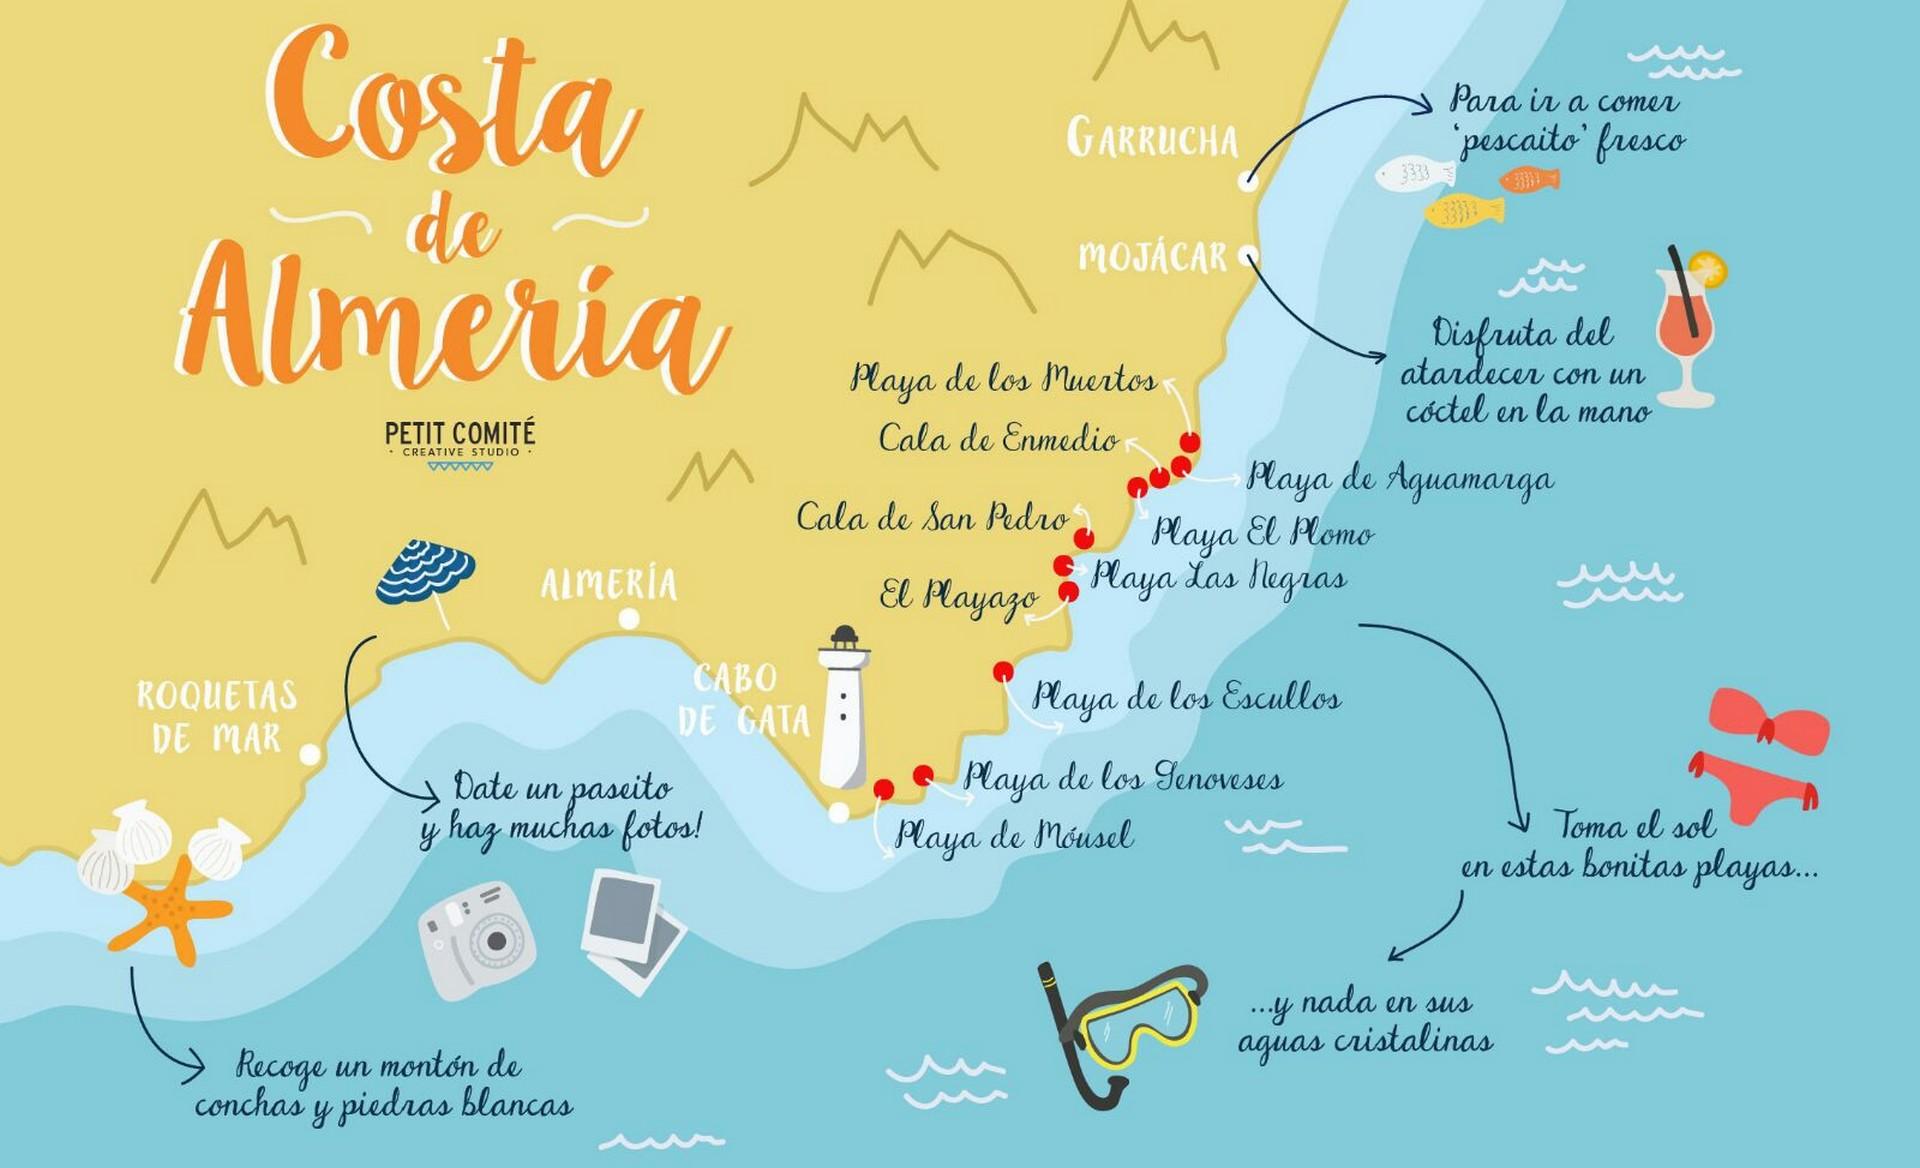 Costa de Almeria kaart